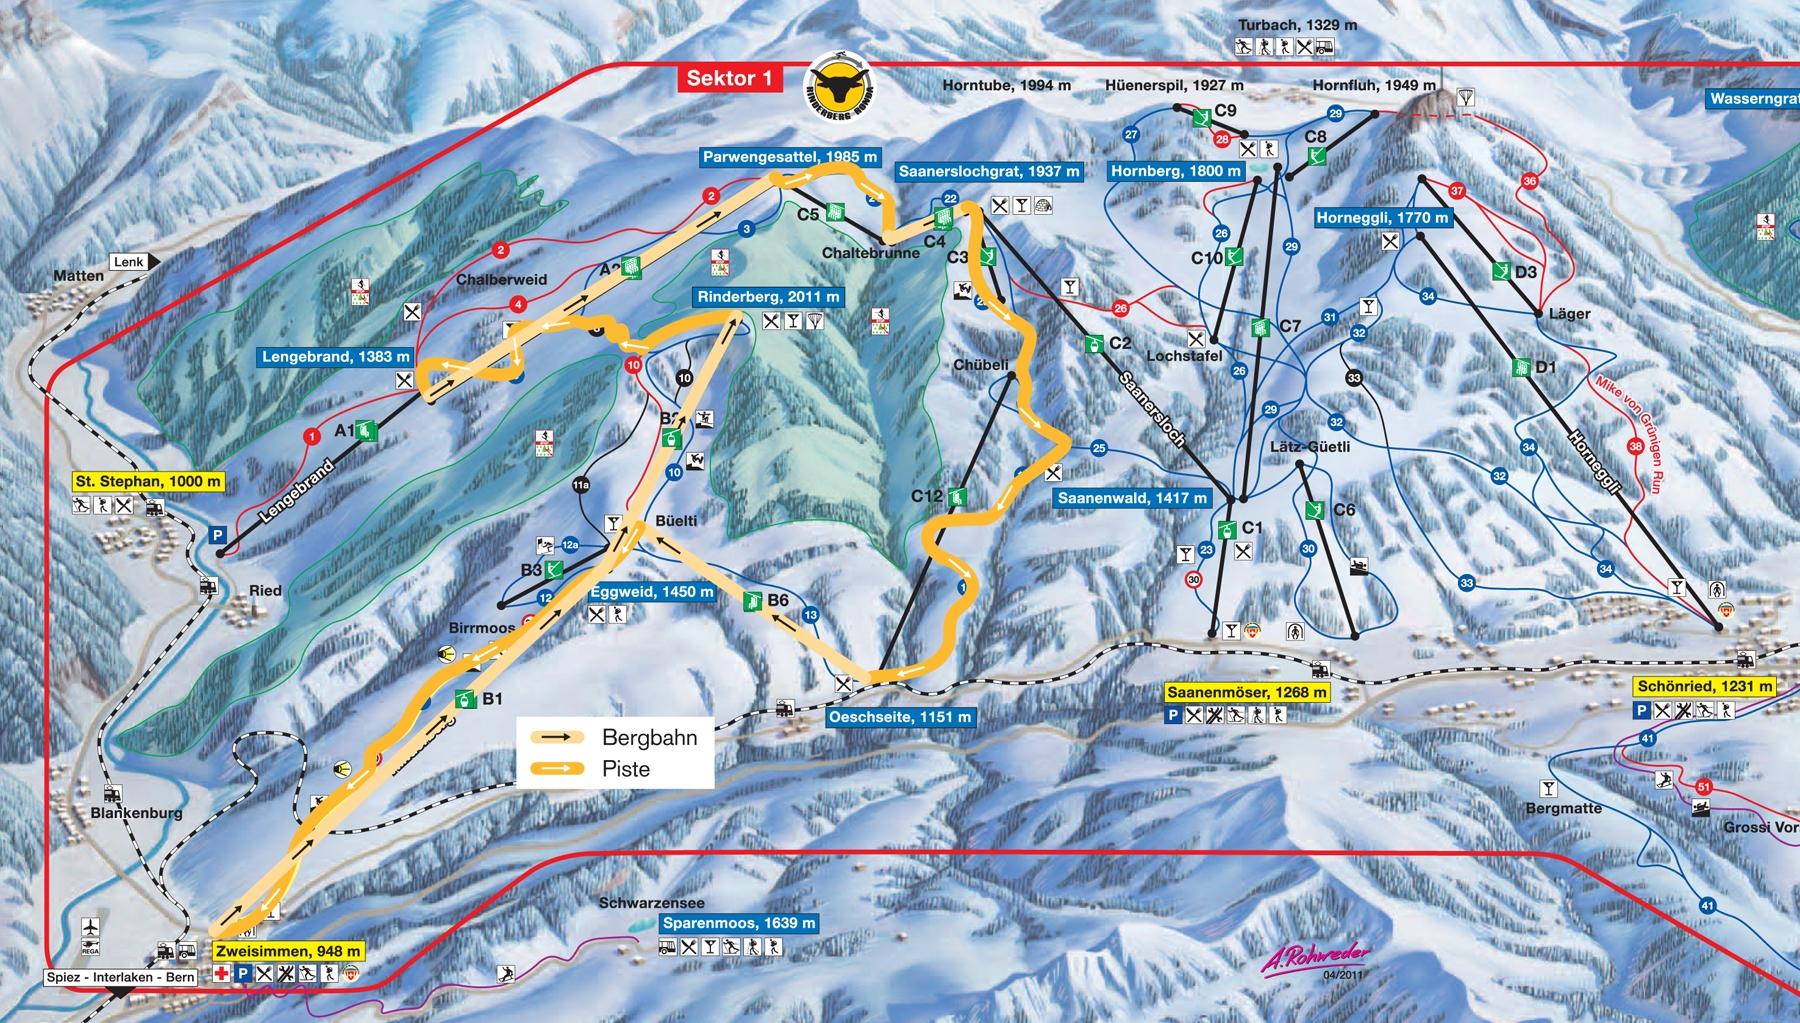 Gstaad/Rinderberg-Saanerslochgrat Piste / Trail Map